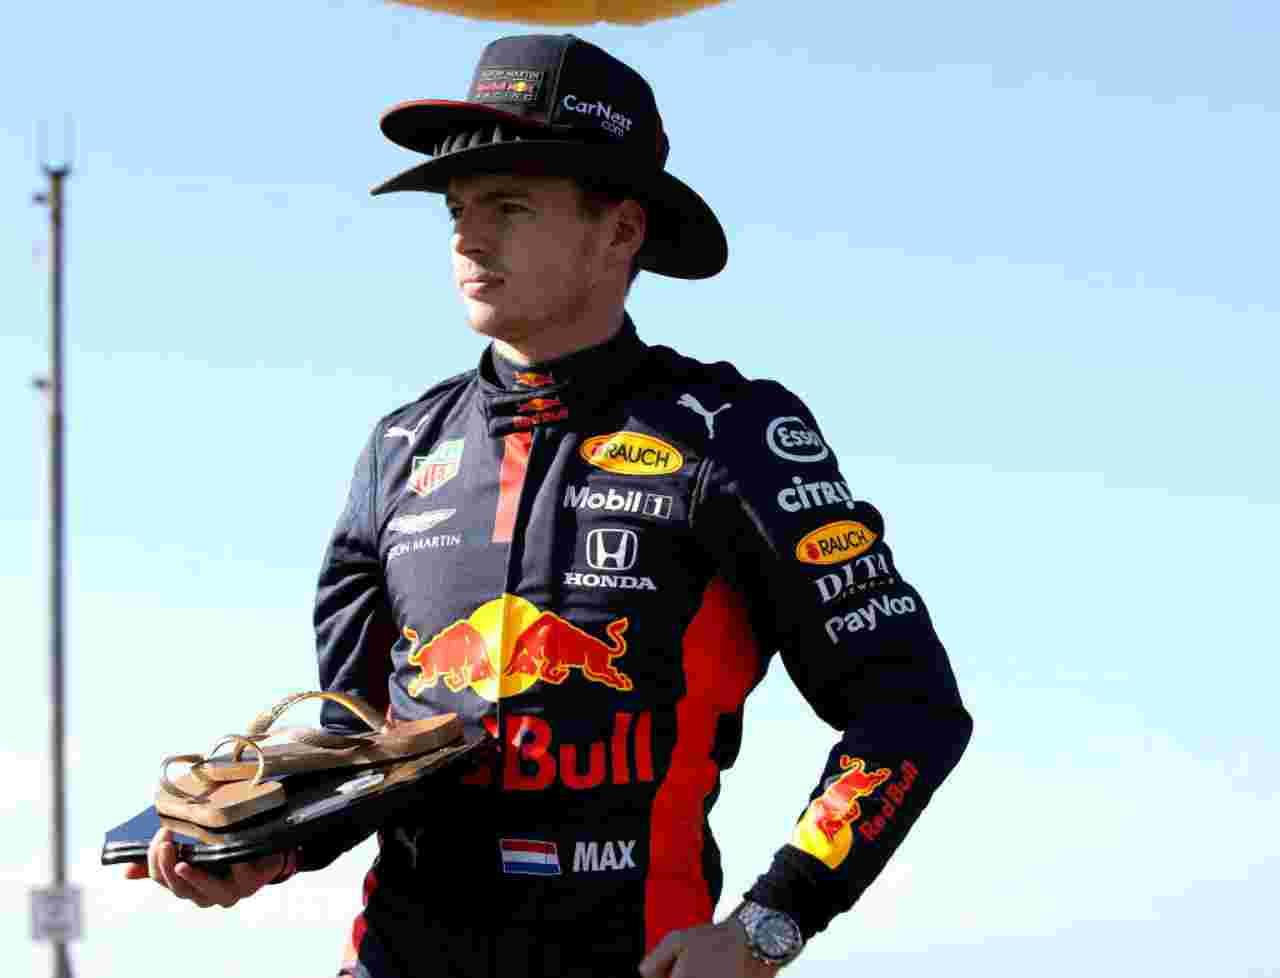 Una simpatica immagine di Max Verstappen in Australia (foto Getty)